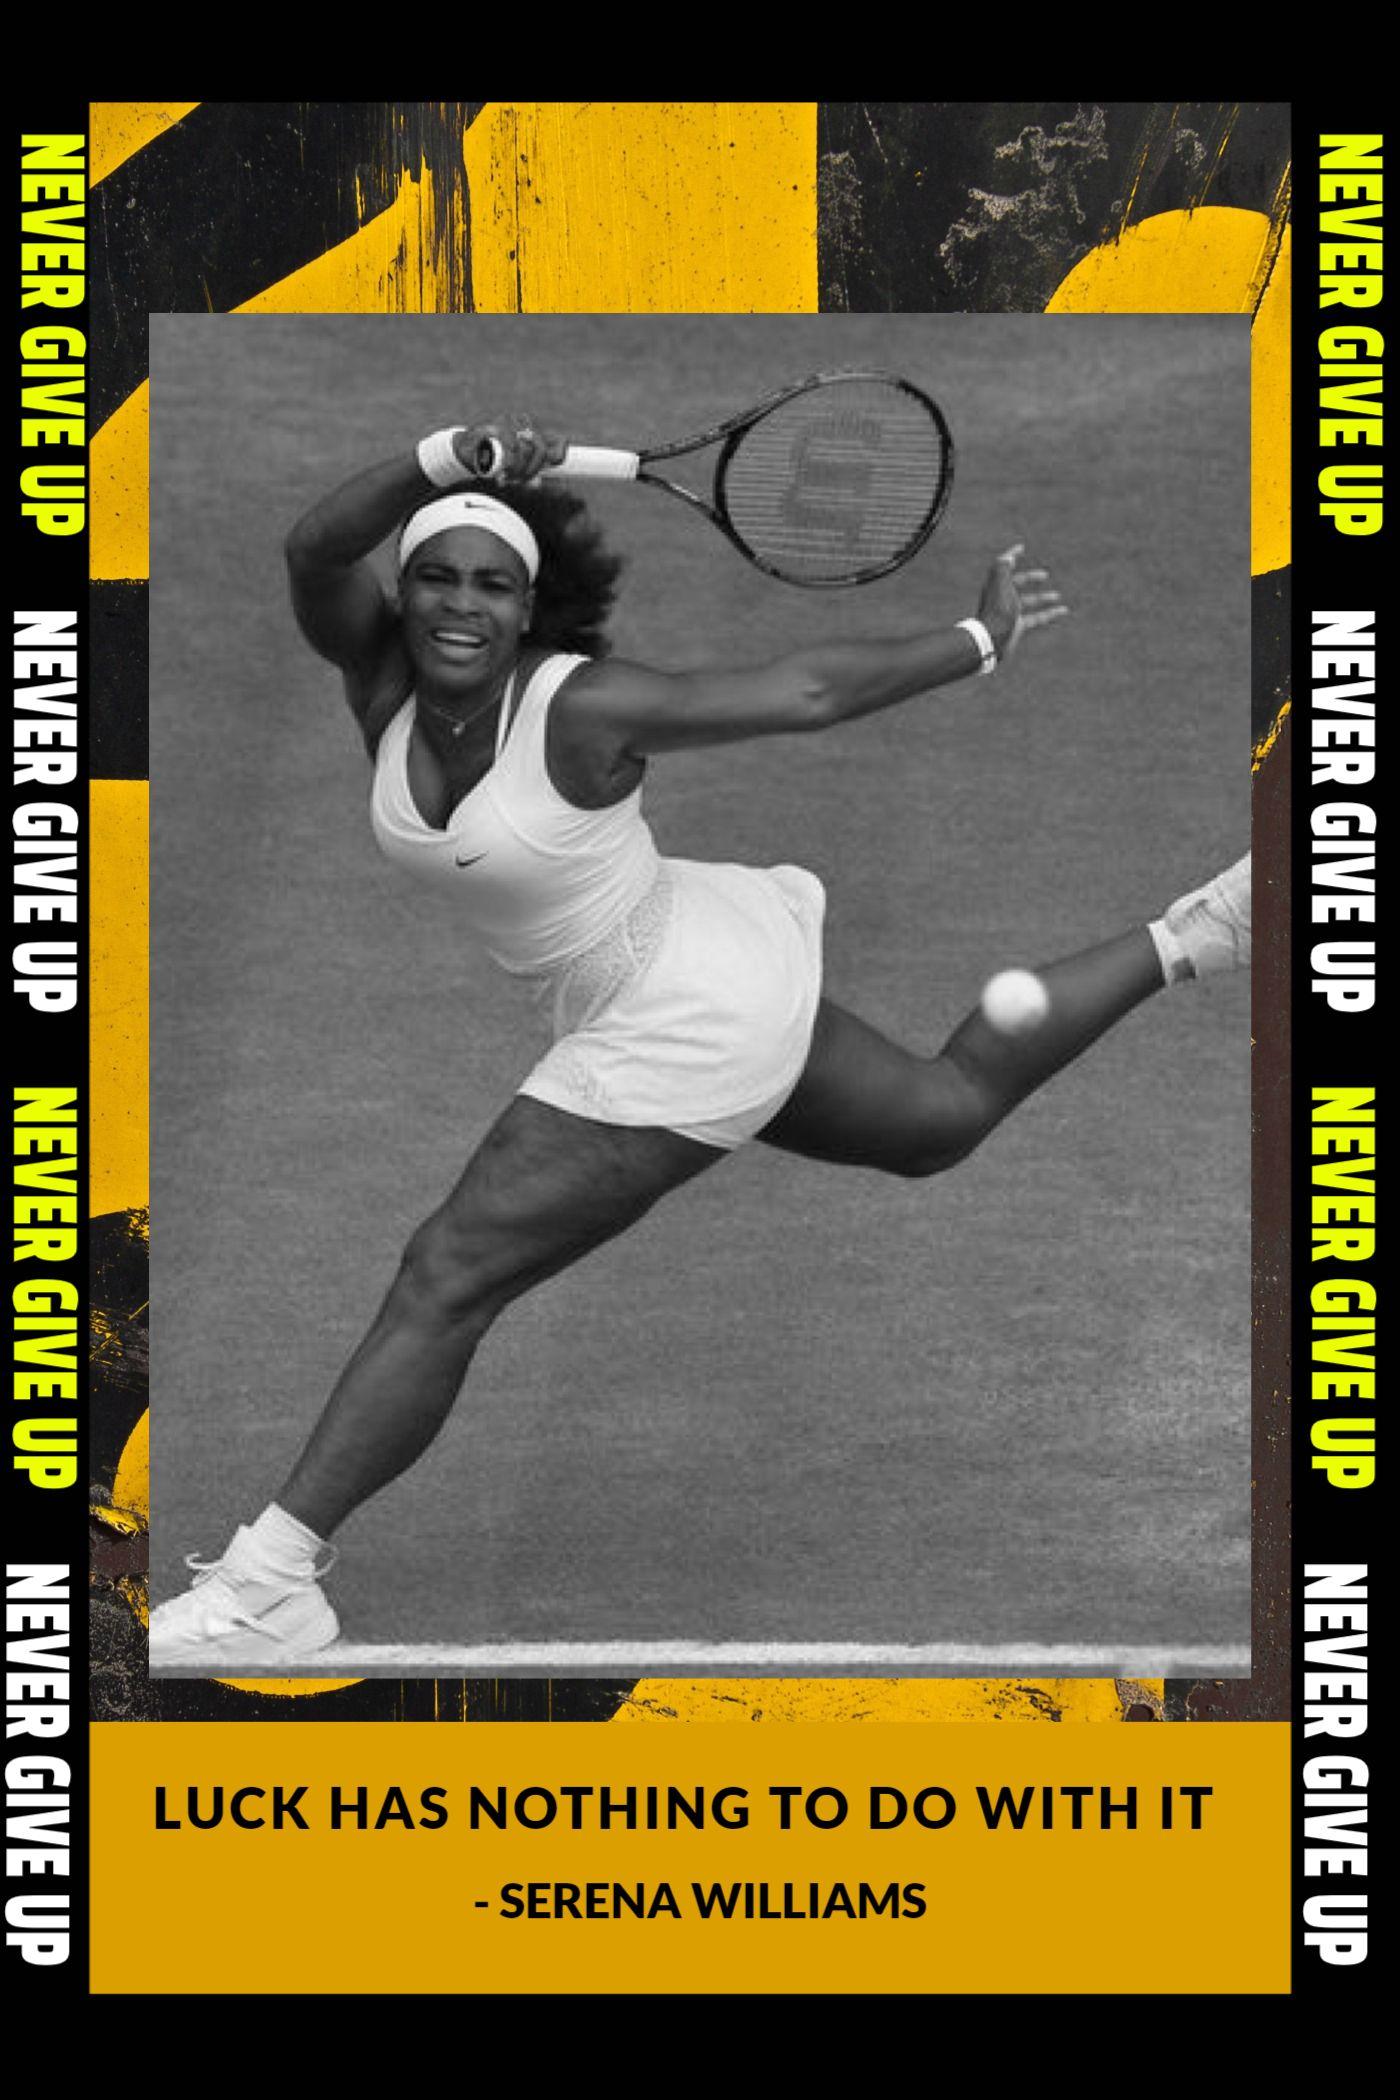 Serena Williams Quote Poster Template